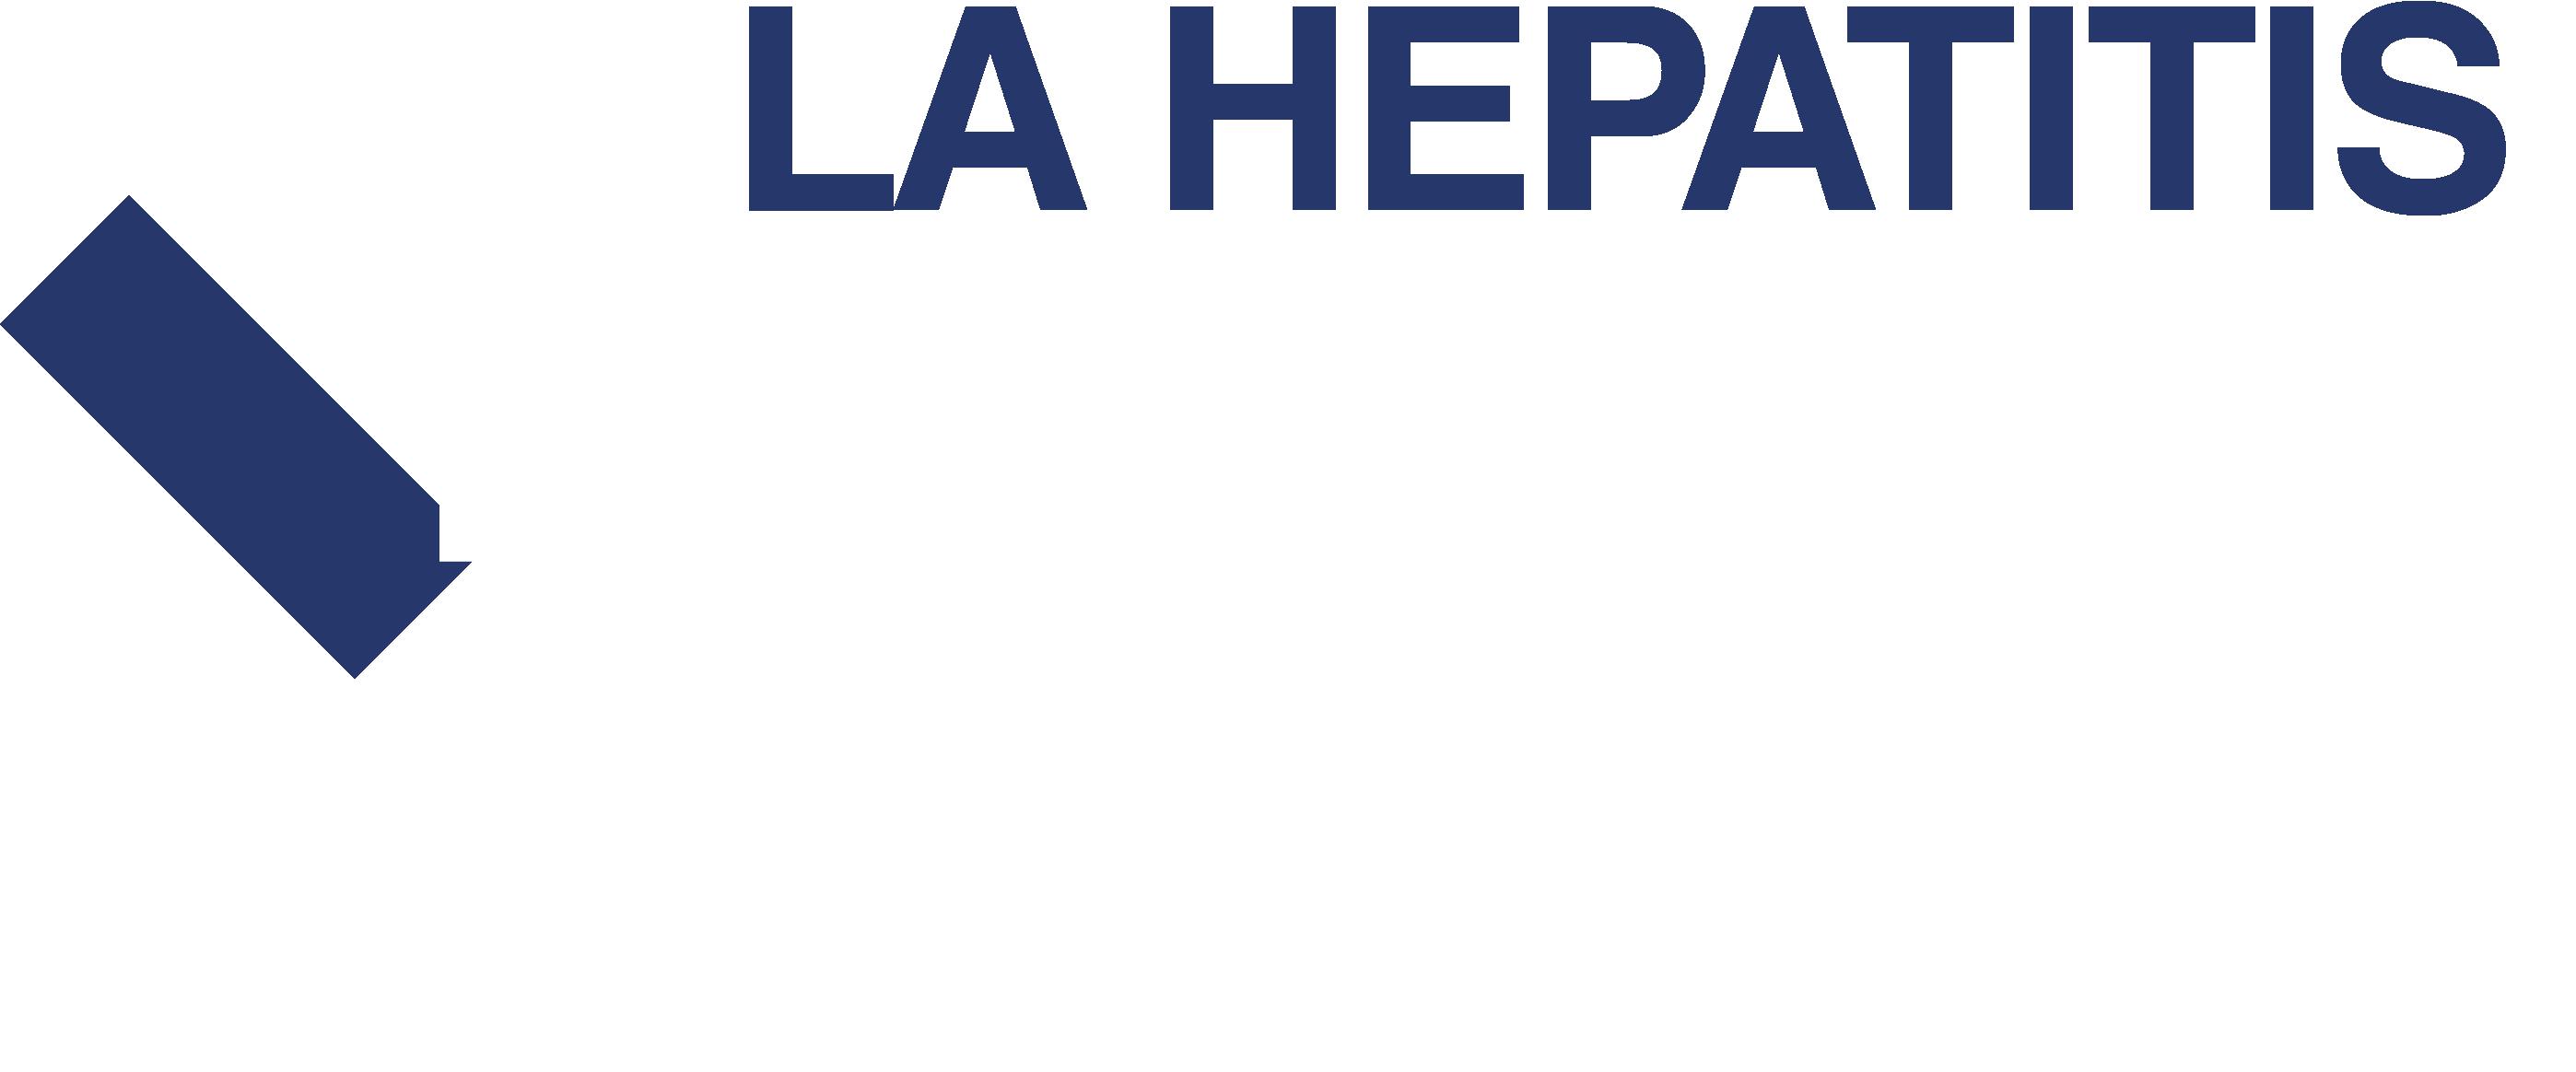 Hep Can't Wait reversed for orange Spanish